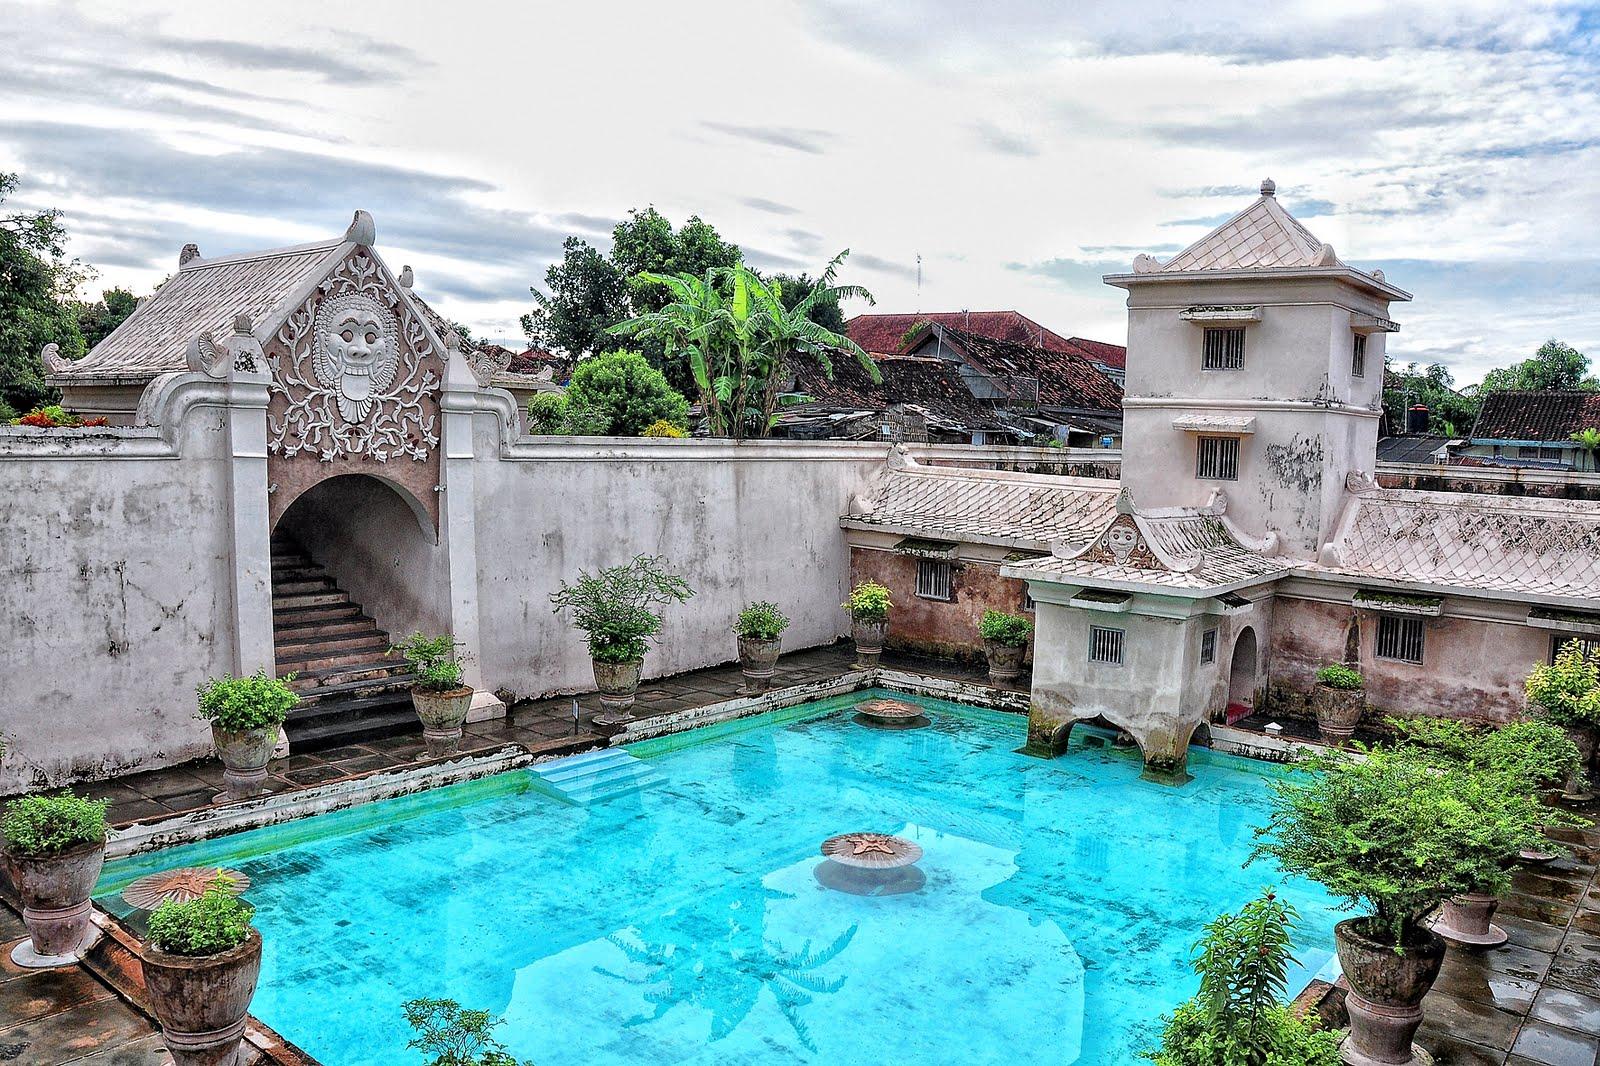 Taman Sari Jogja - AkuTravel. Sumber: Tour Yogyakarta